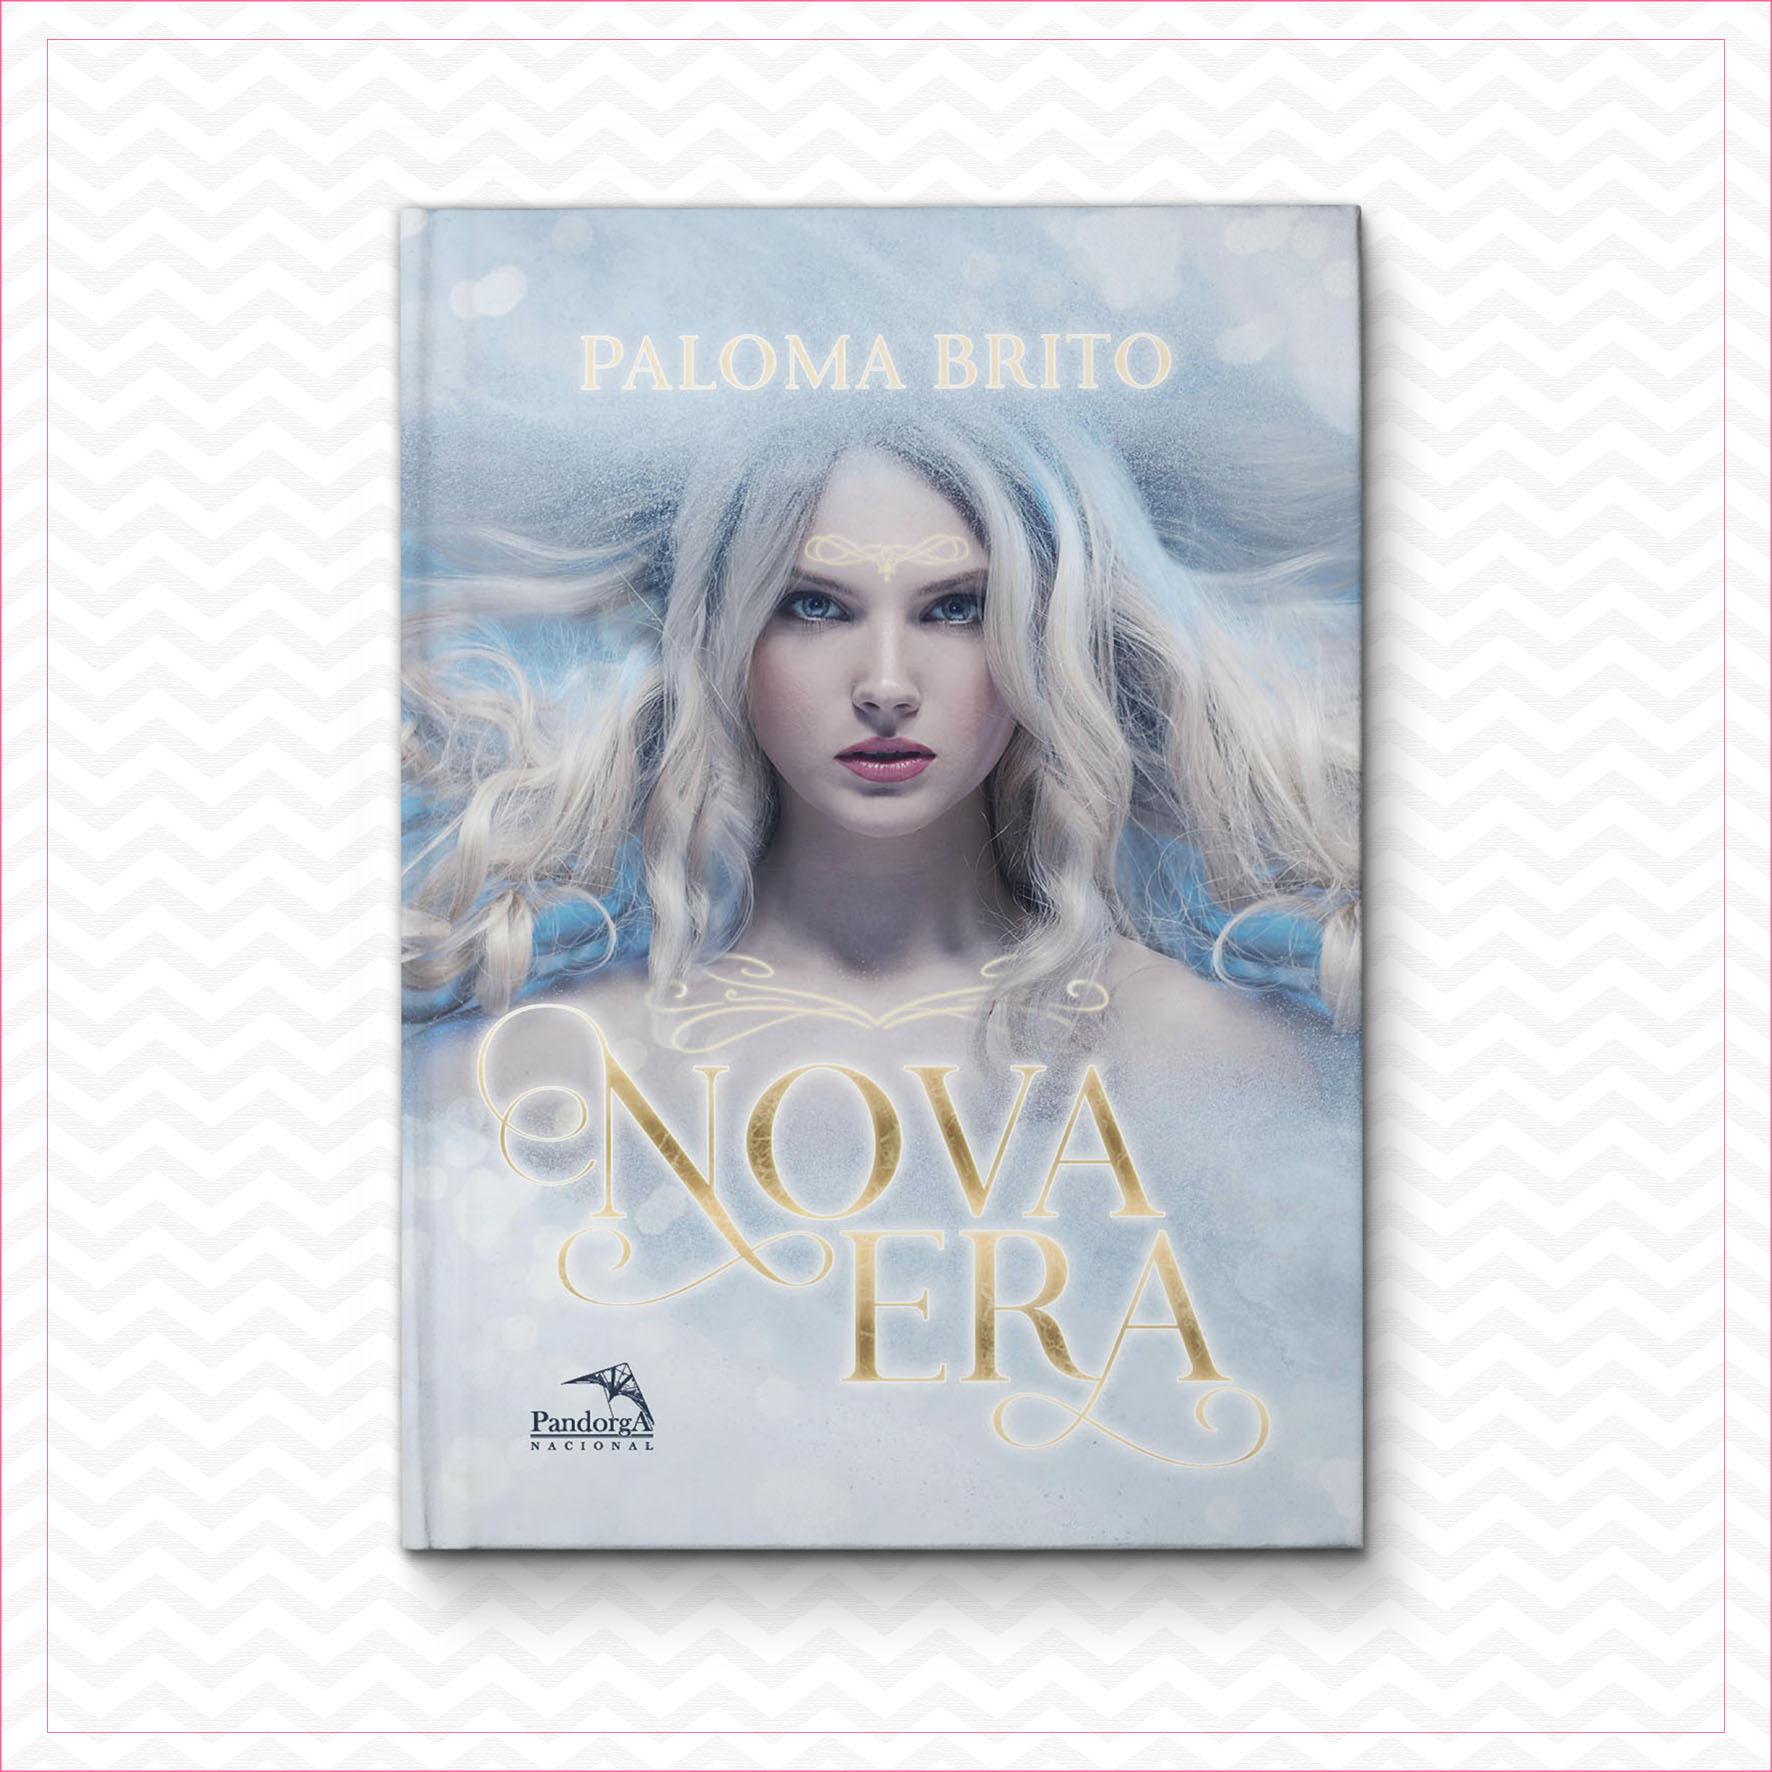 Nova Era – Paloma Brito